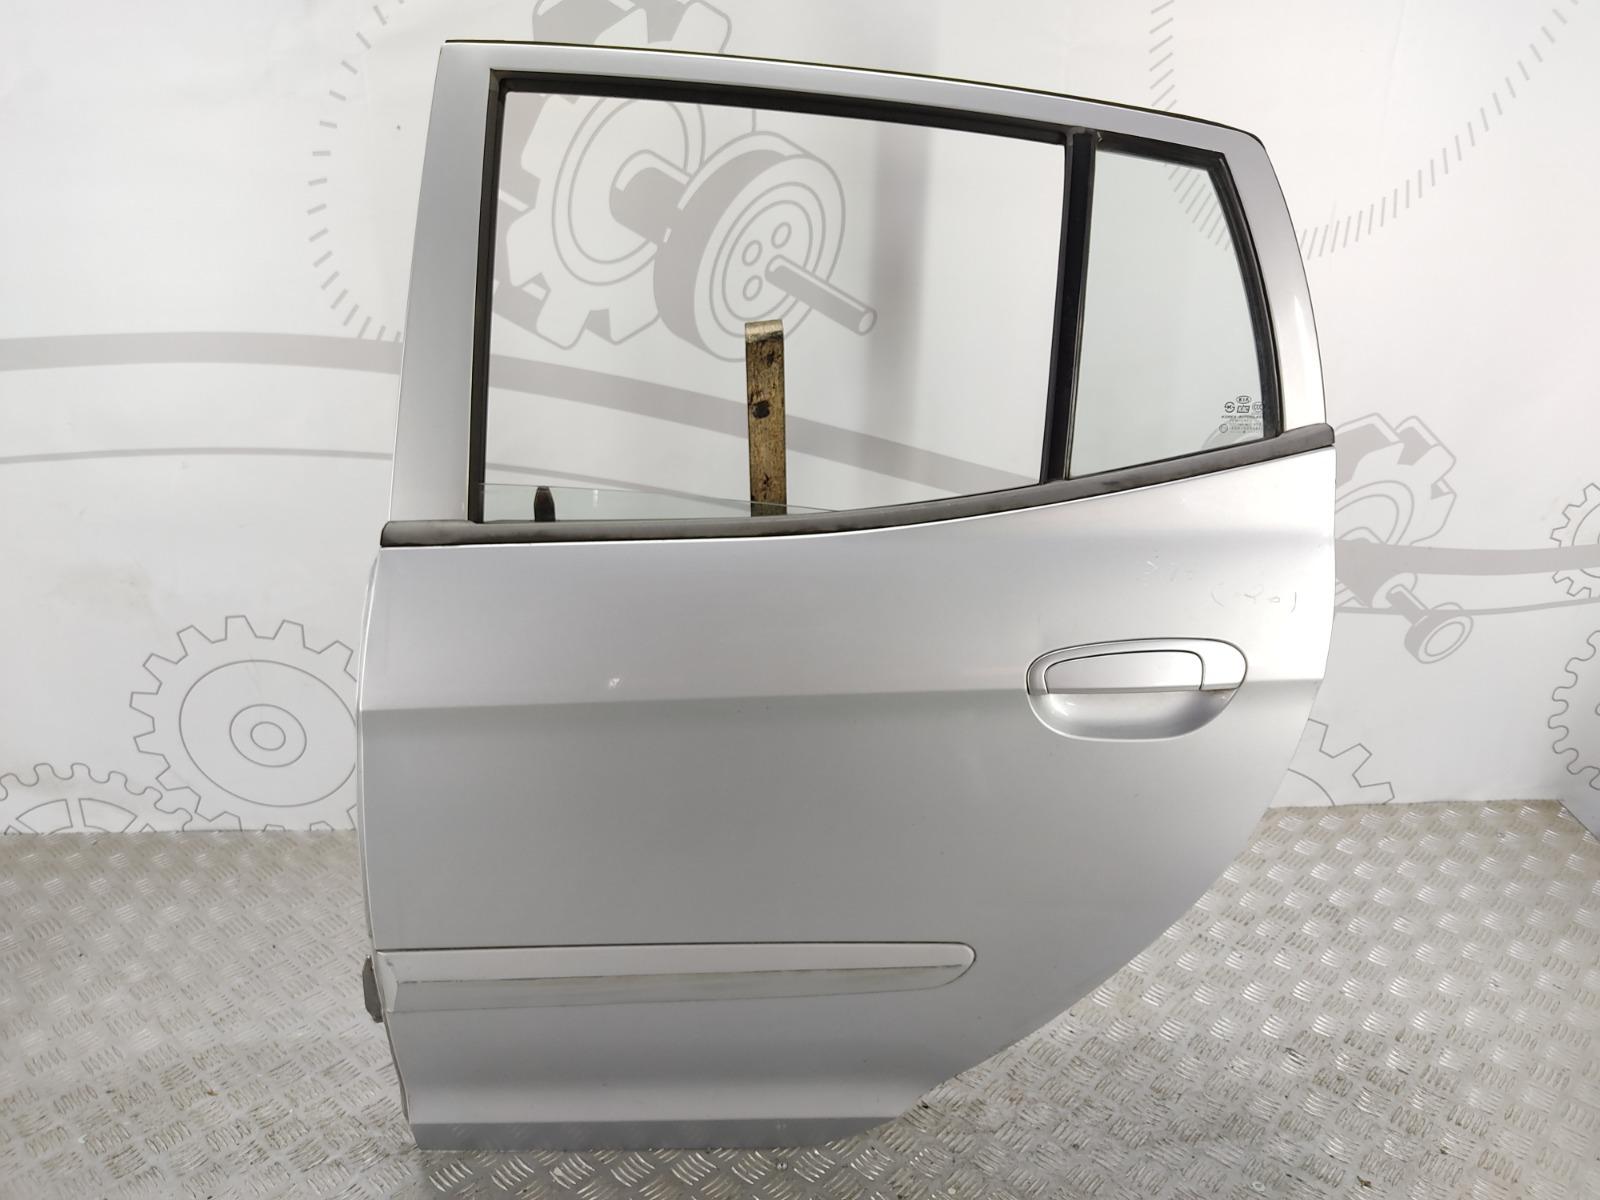 Дверь задняя левая Kia Picanto 1.1 I 2004 (б/у)